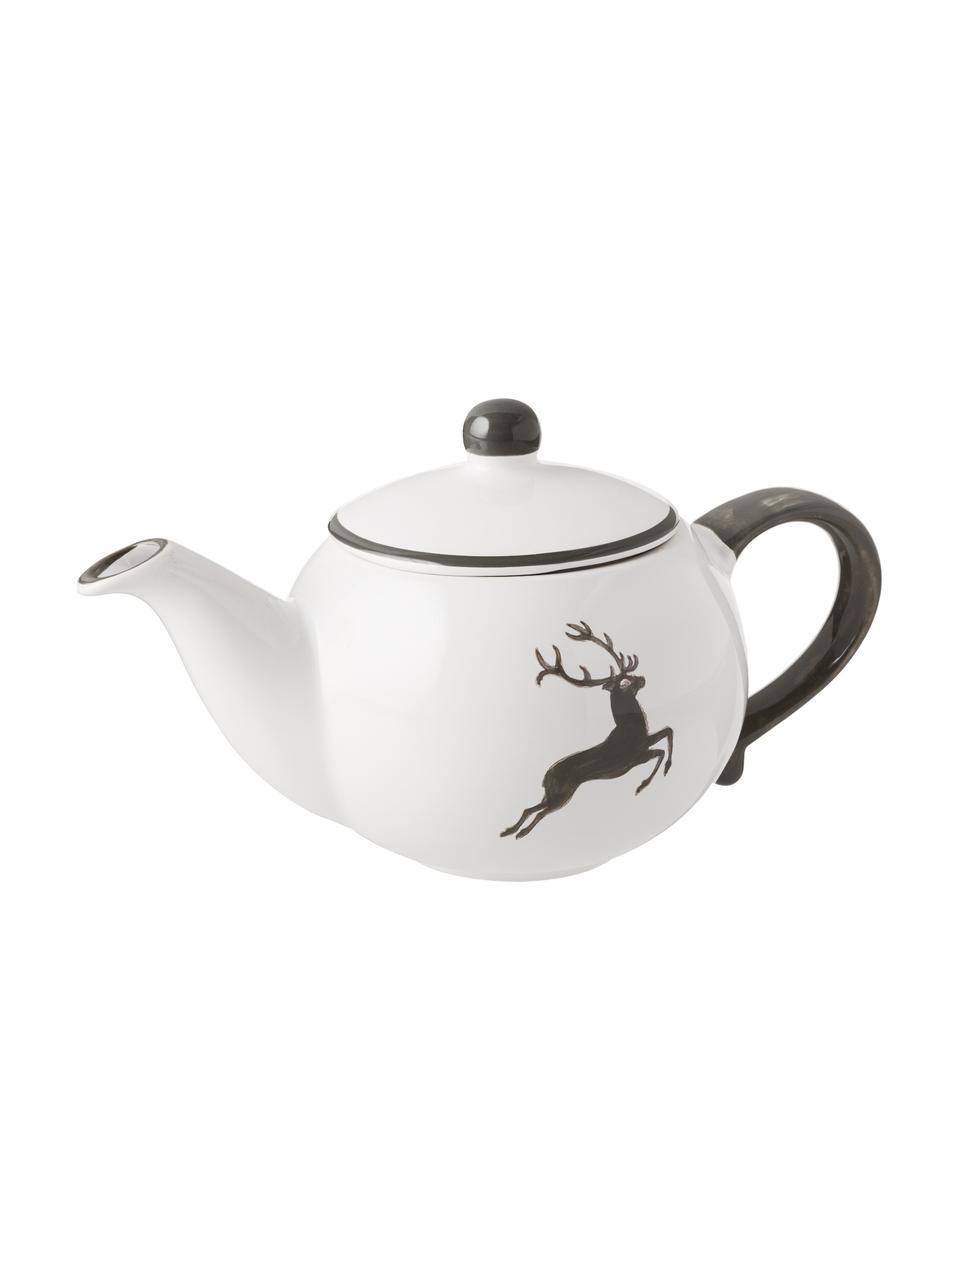 Handbemalte Teekanne Classic Grauer Hirsch, Keramik, Grau,Weiß, 500 ml